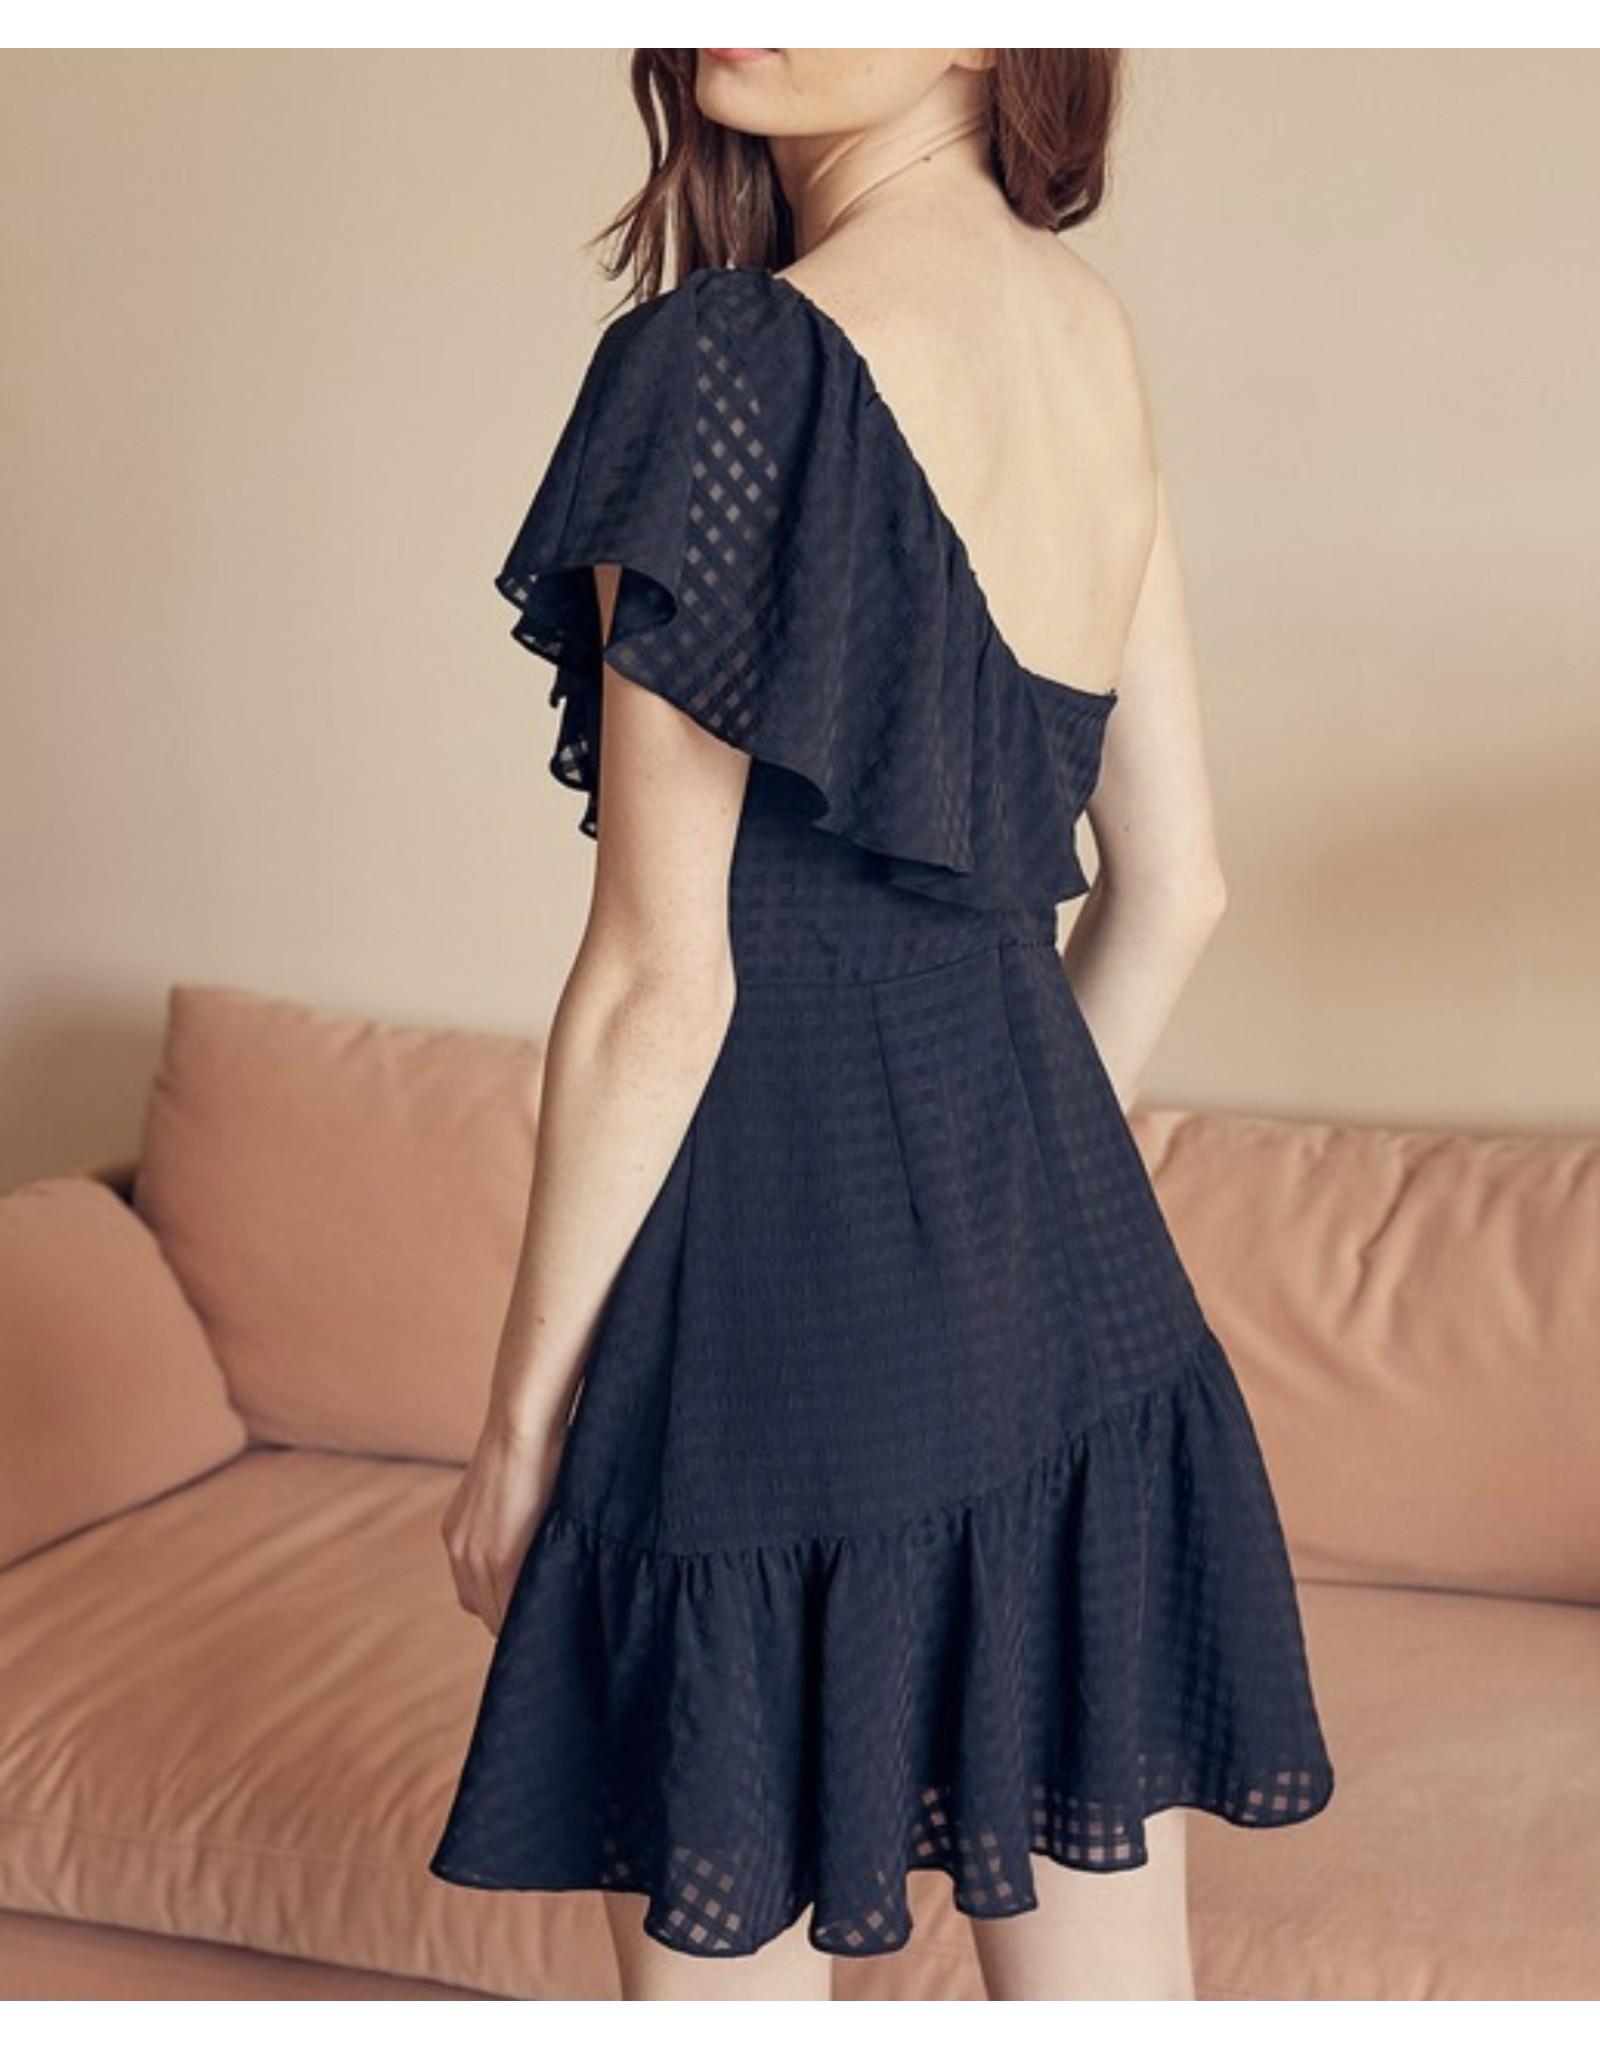 One Shoulders Ruffle Dress - Black